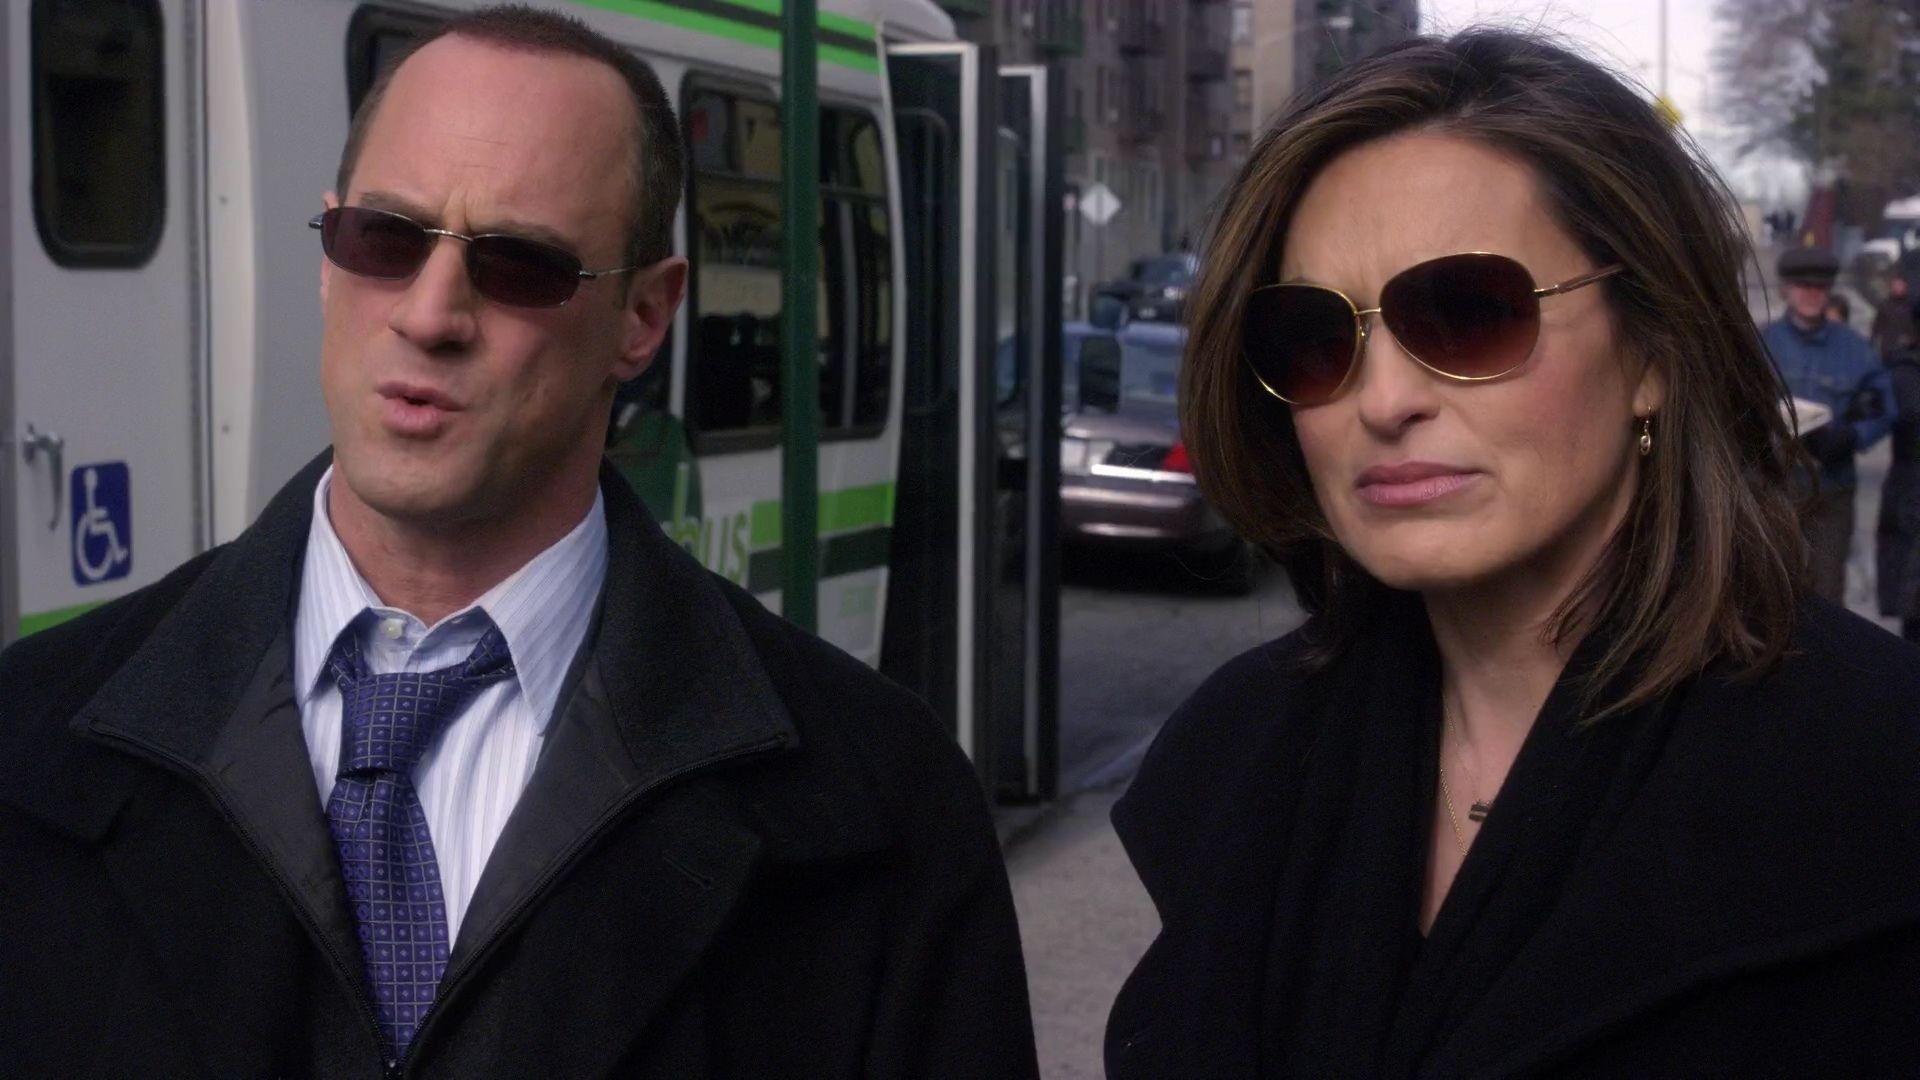 Detectives Elliot Stabler Olivia Benson Season Eleven Law And Order Svu Special Victims Unit Benson And Stabler